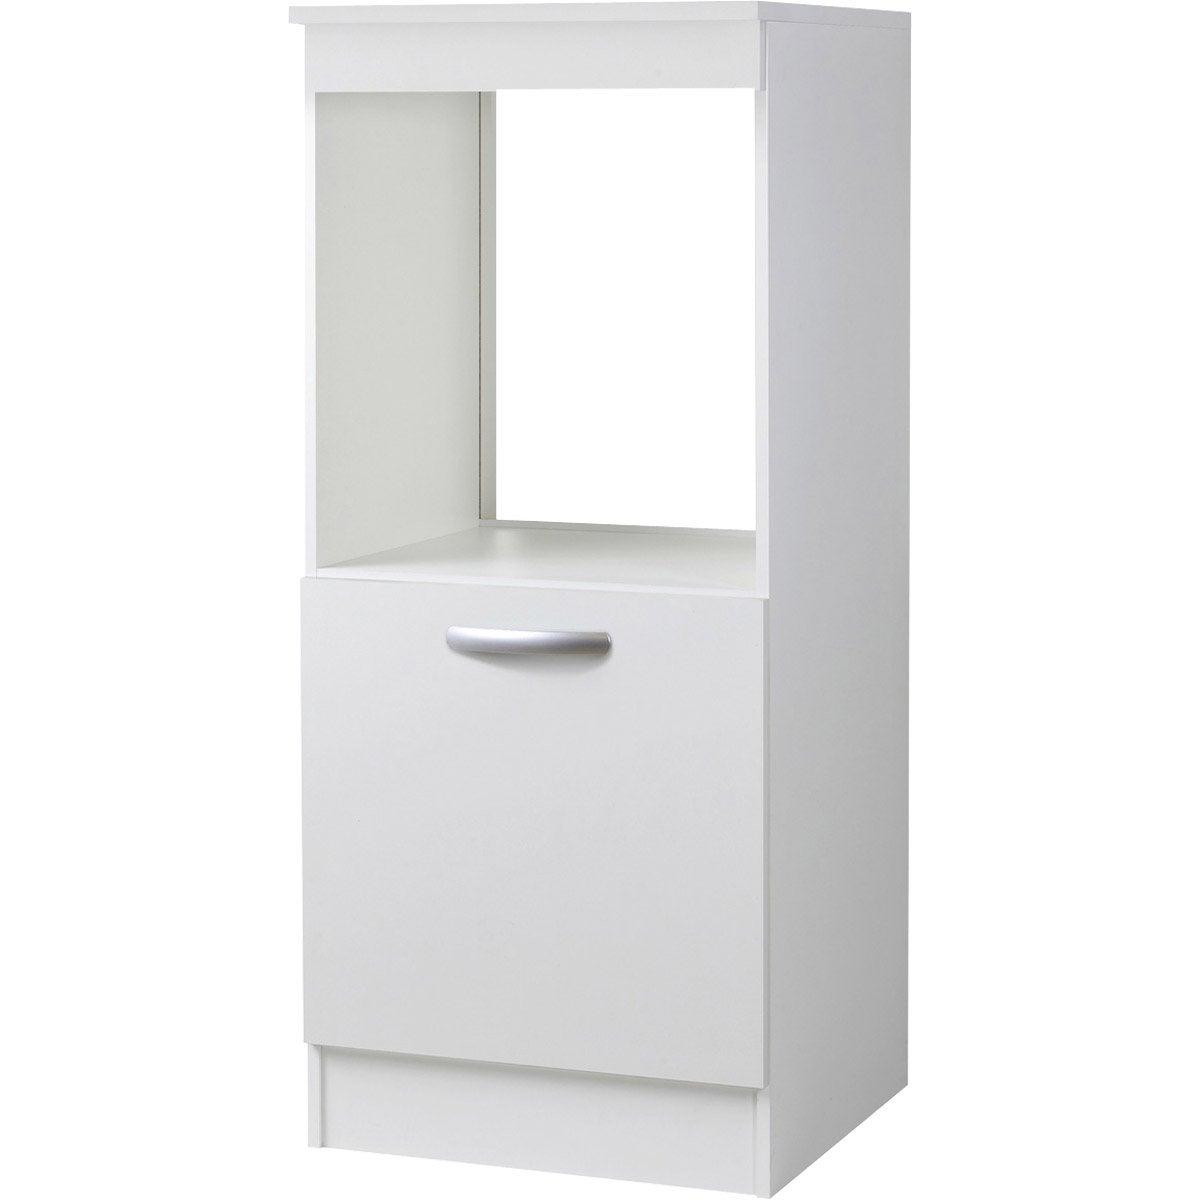 Meuble de cuisine 1 2 colonne 1 porte blanc l60x - Porte meuble cuisine leroy merlin ...